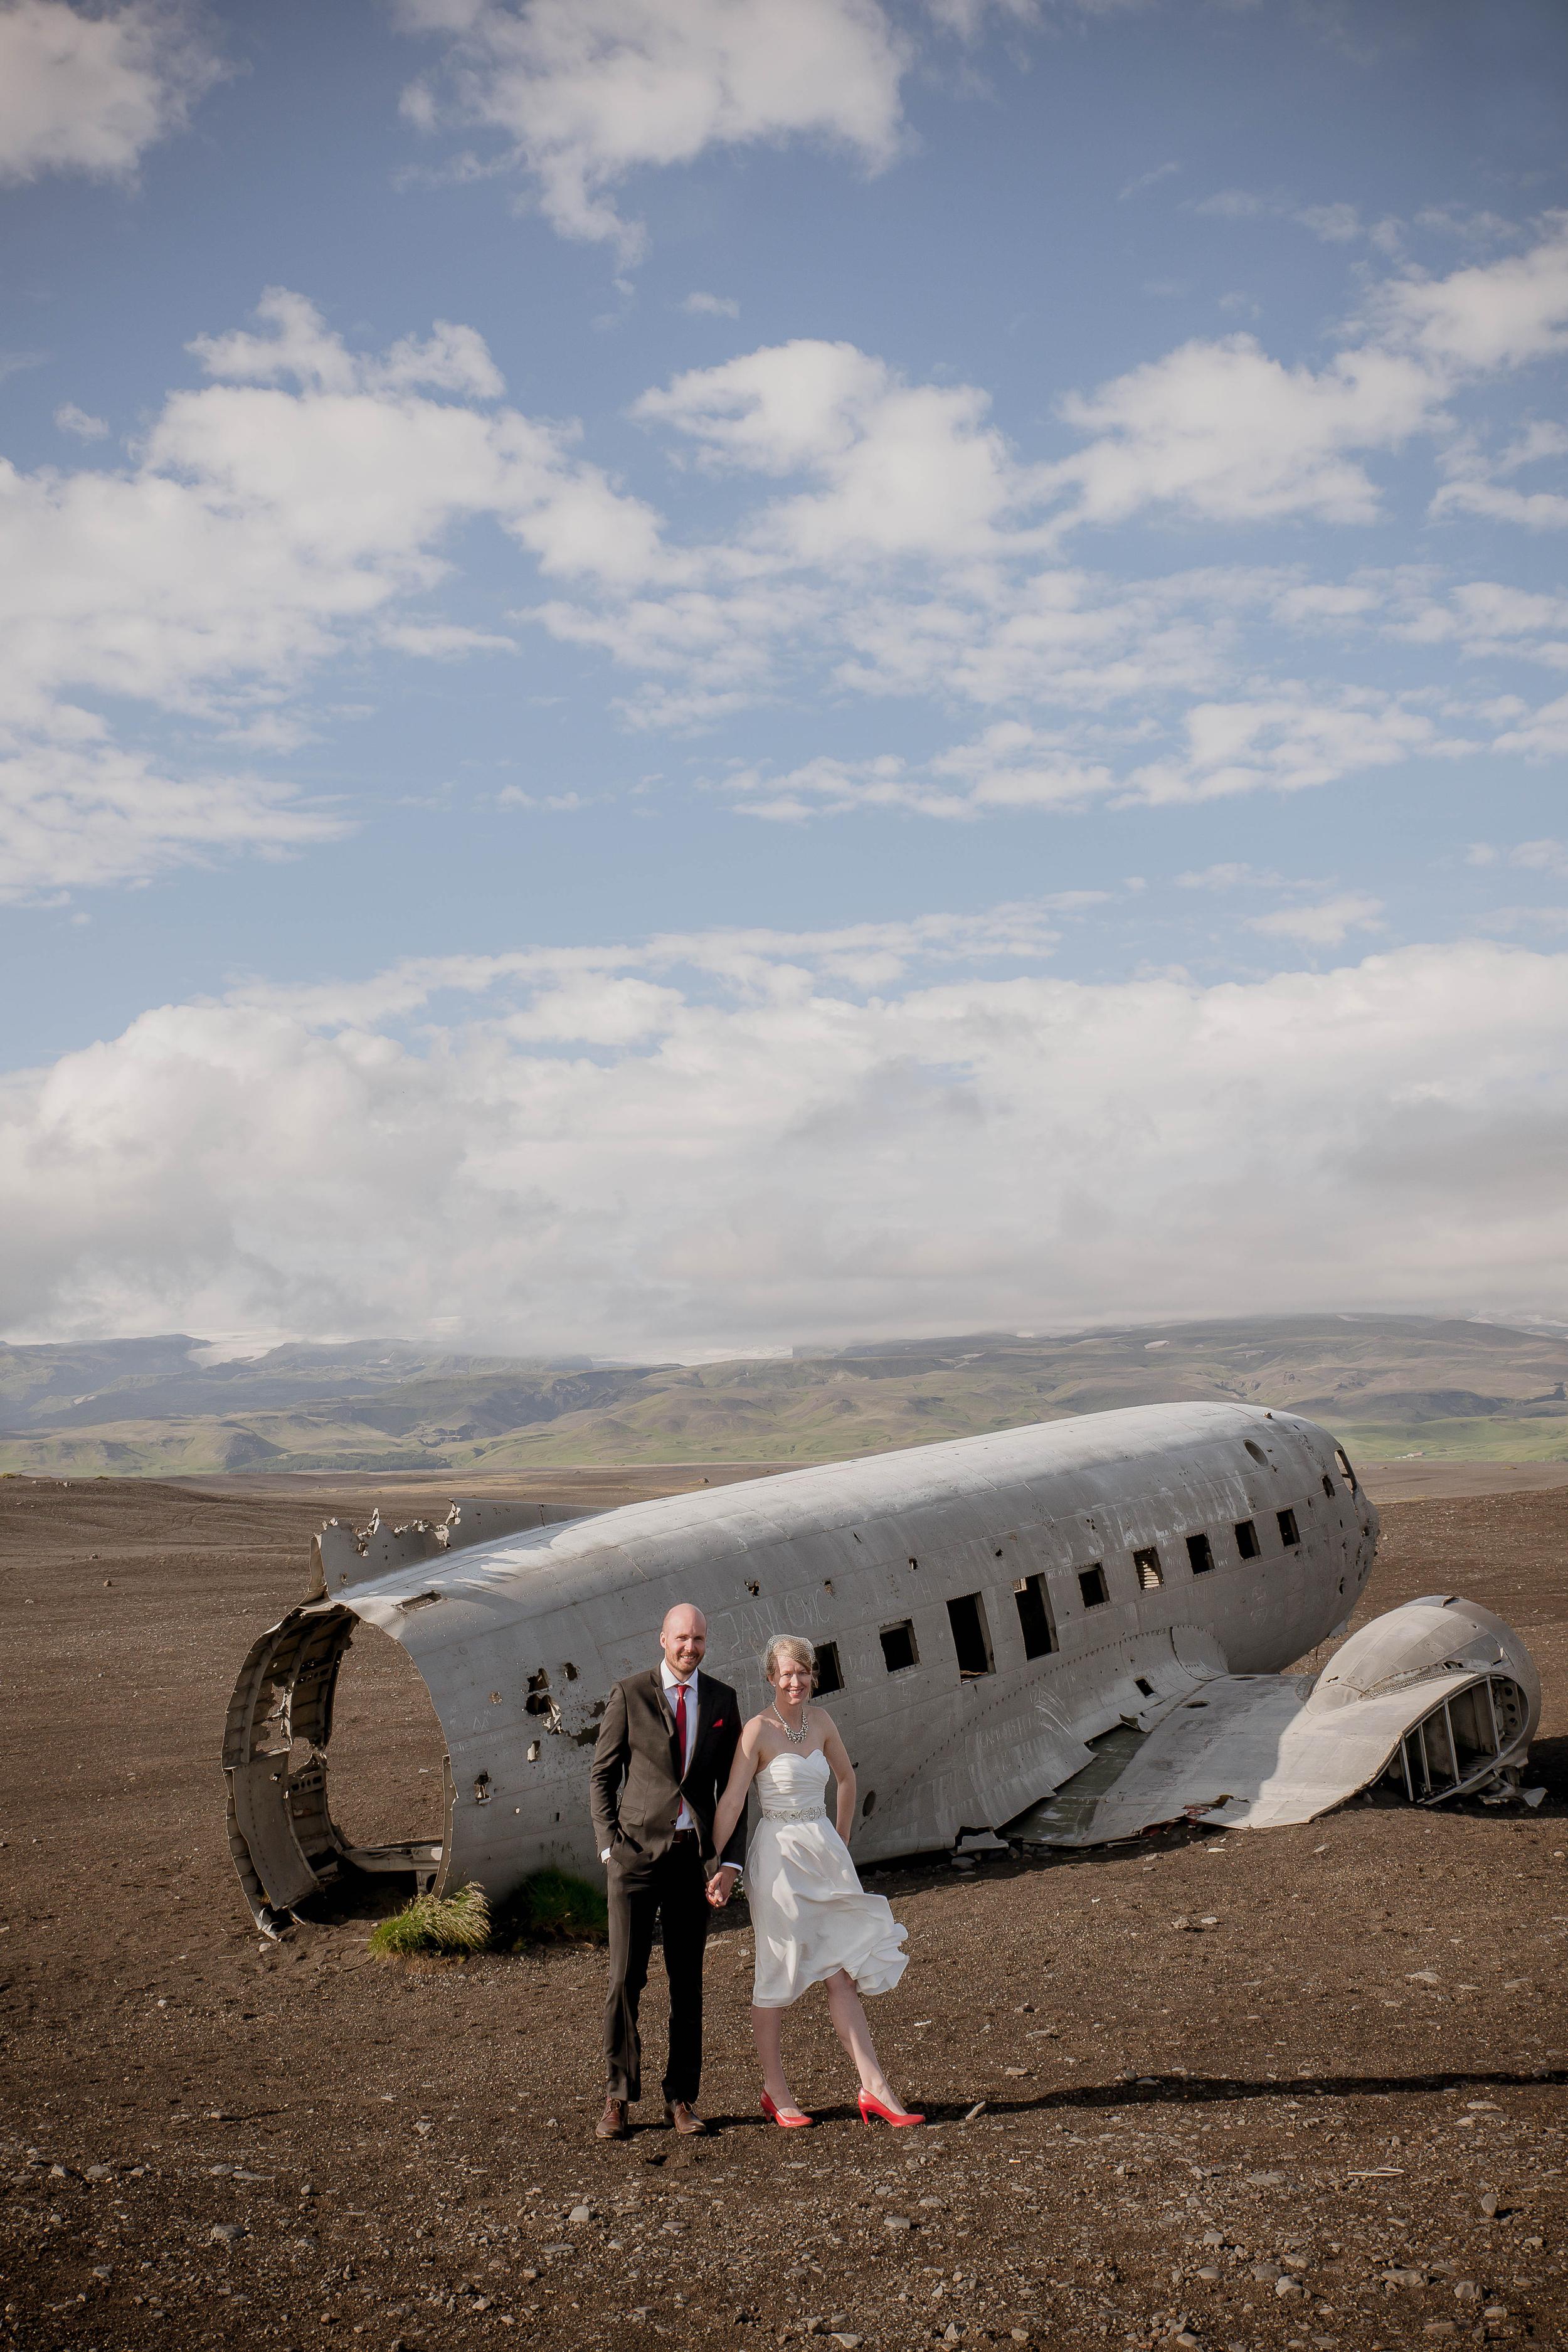 Iceland Crashed Airplane Wedding Photos by Miss Ann-7.jpg